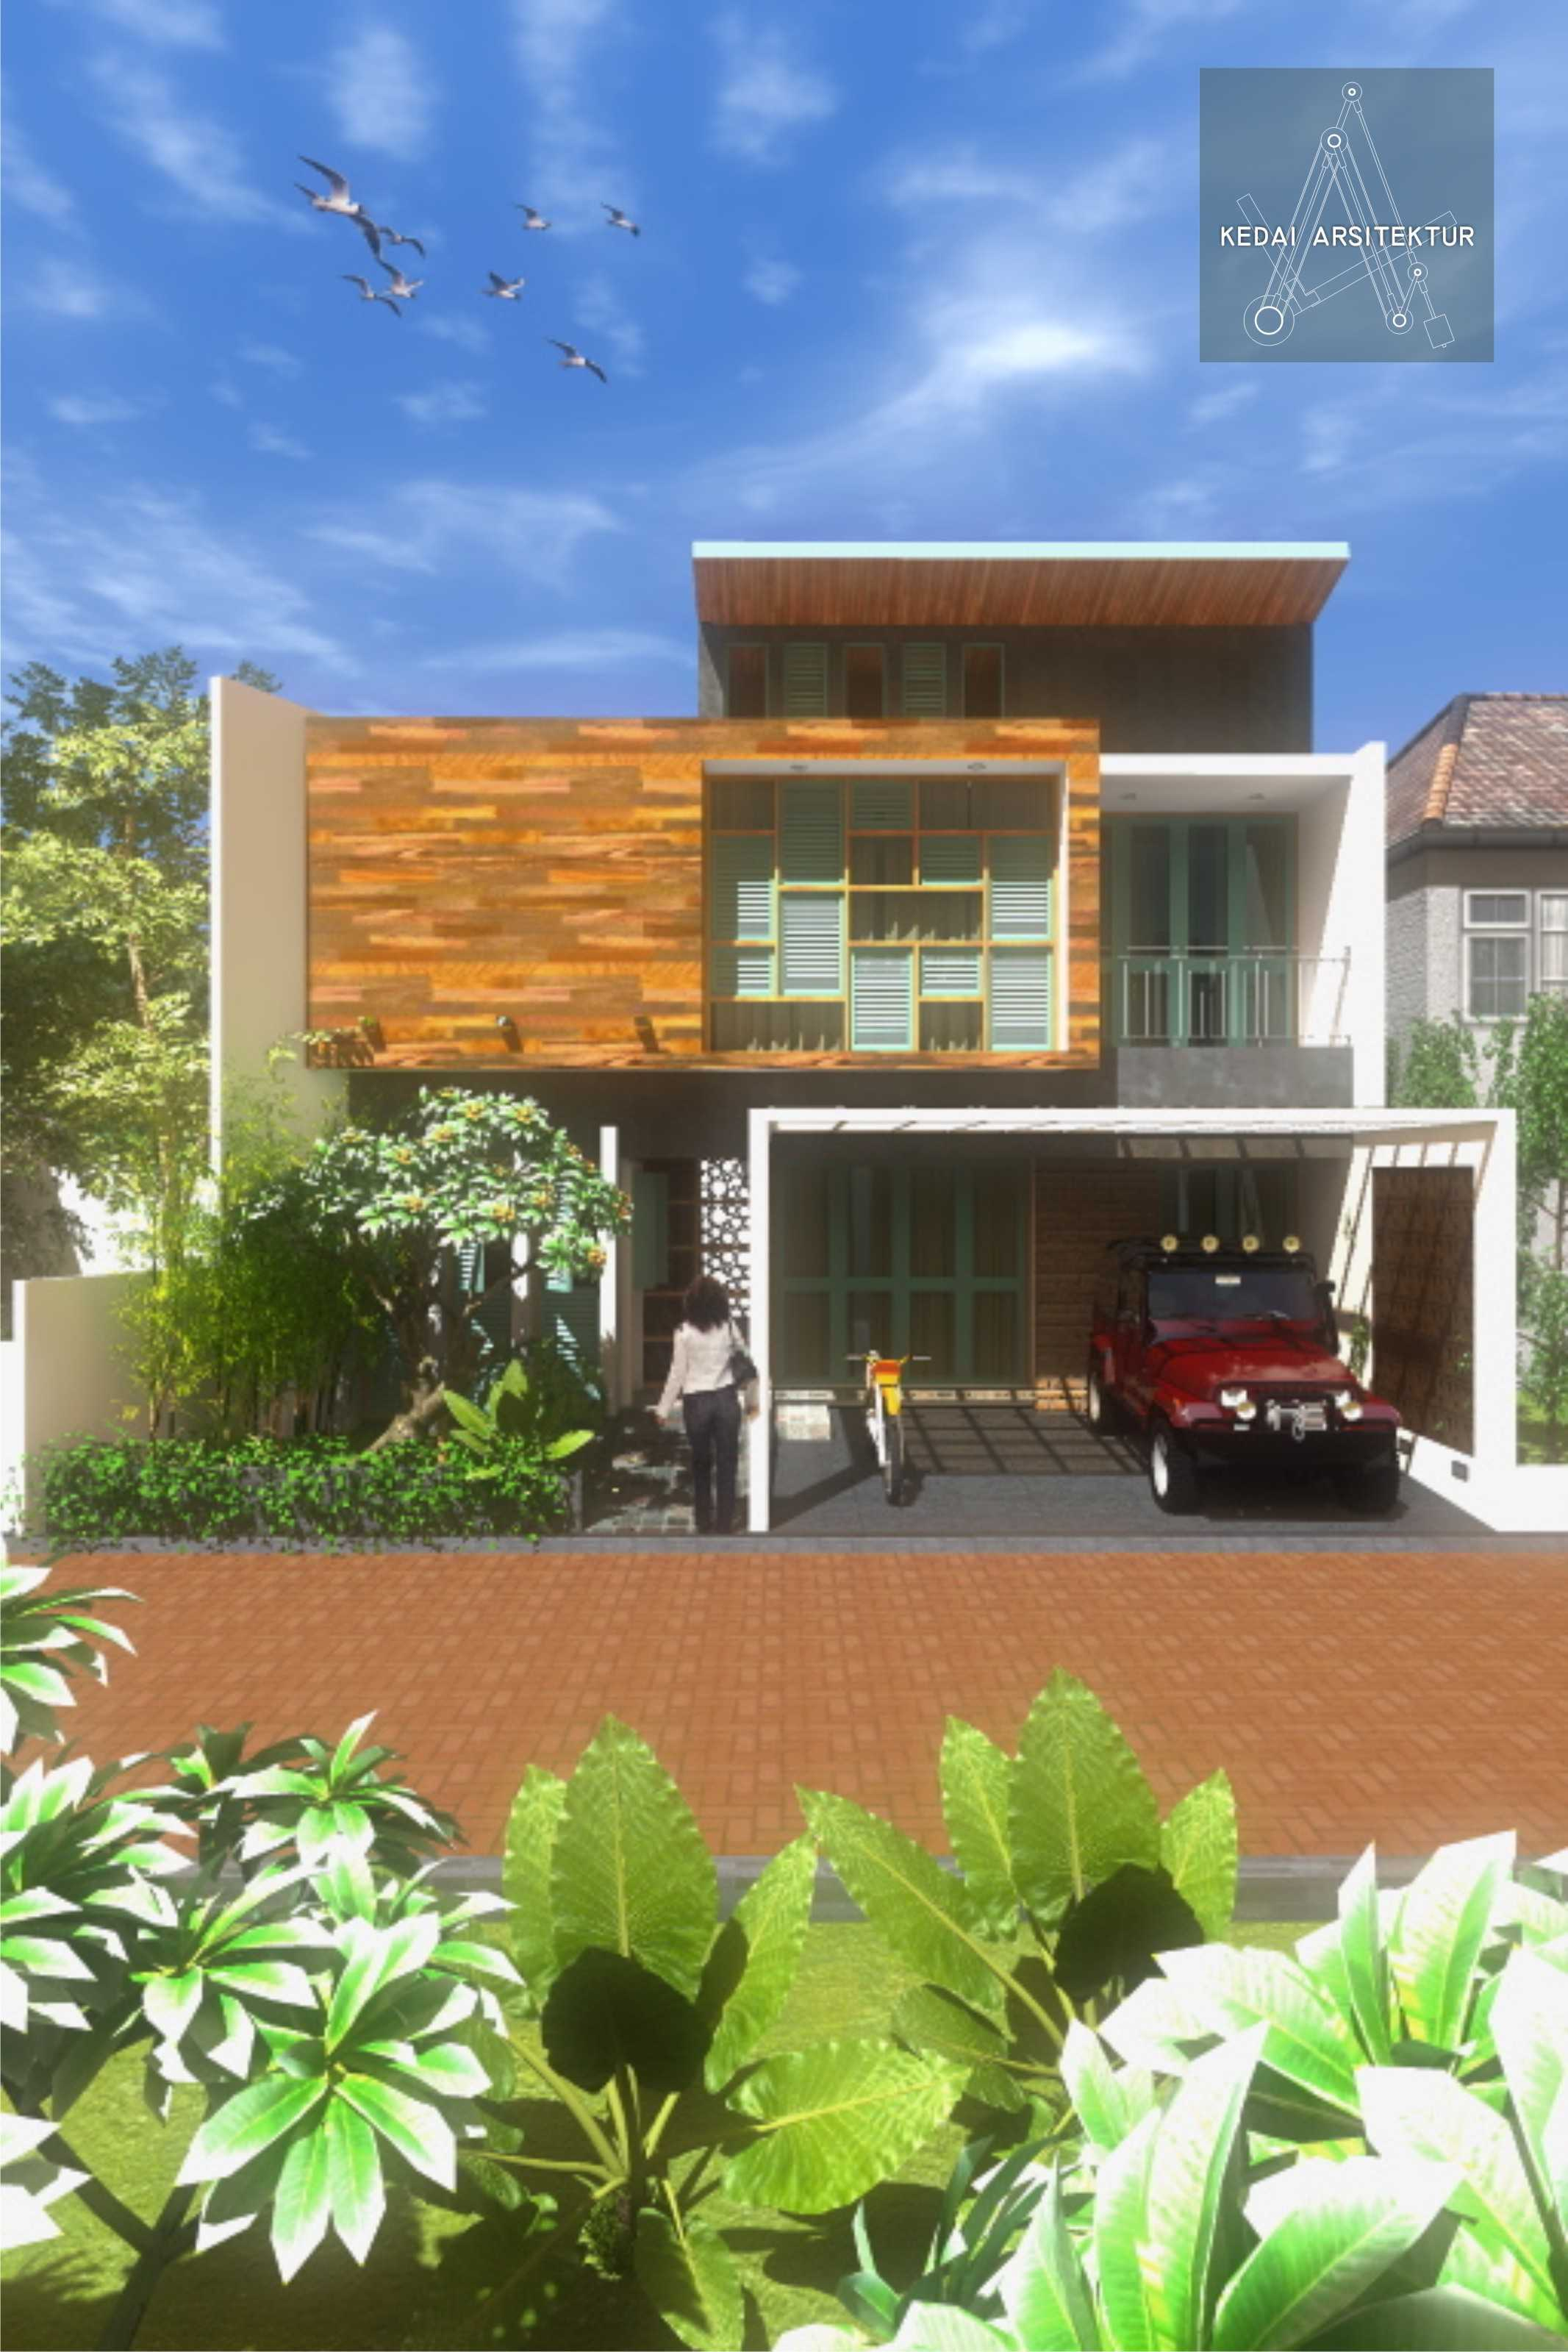 Kedai.arsitektur Rumah Puri Bali-5 Bojongsari, Kota Depok, Jawa Barat, Indonesia  Rmh-Puri-Bali-5-Image-2 Industrial  35888